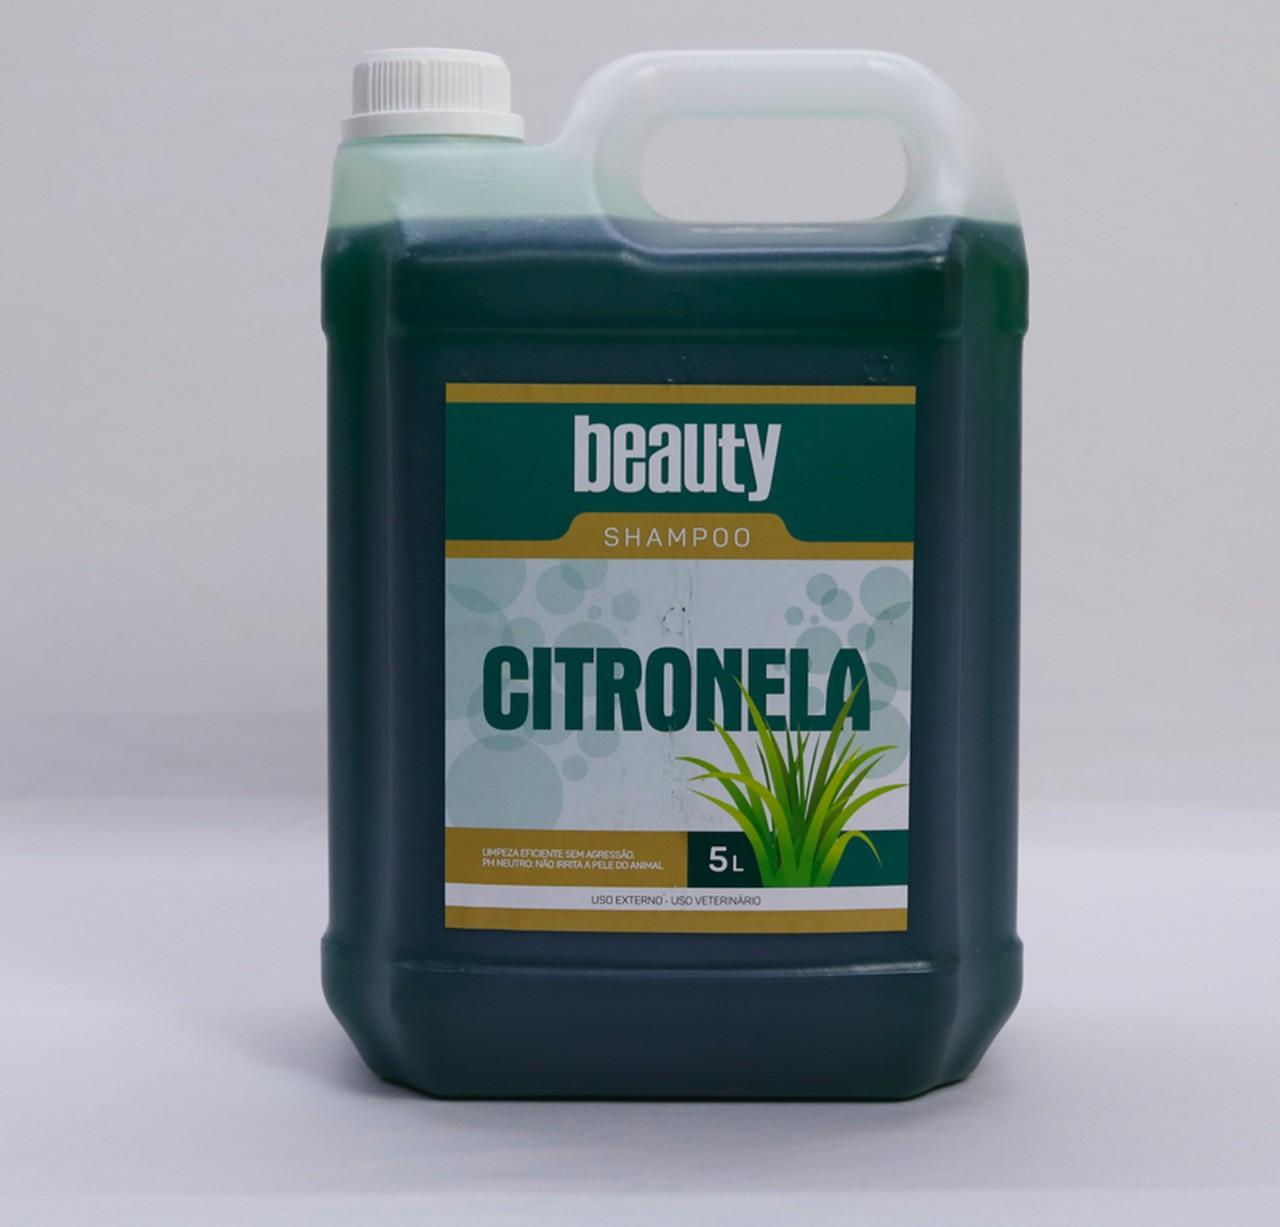 Shampoo Beauty Citronela